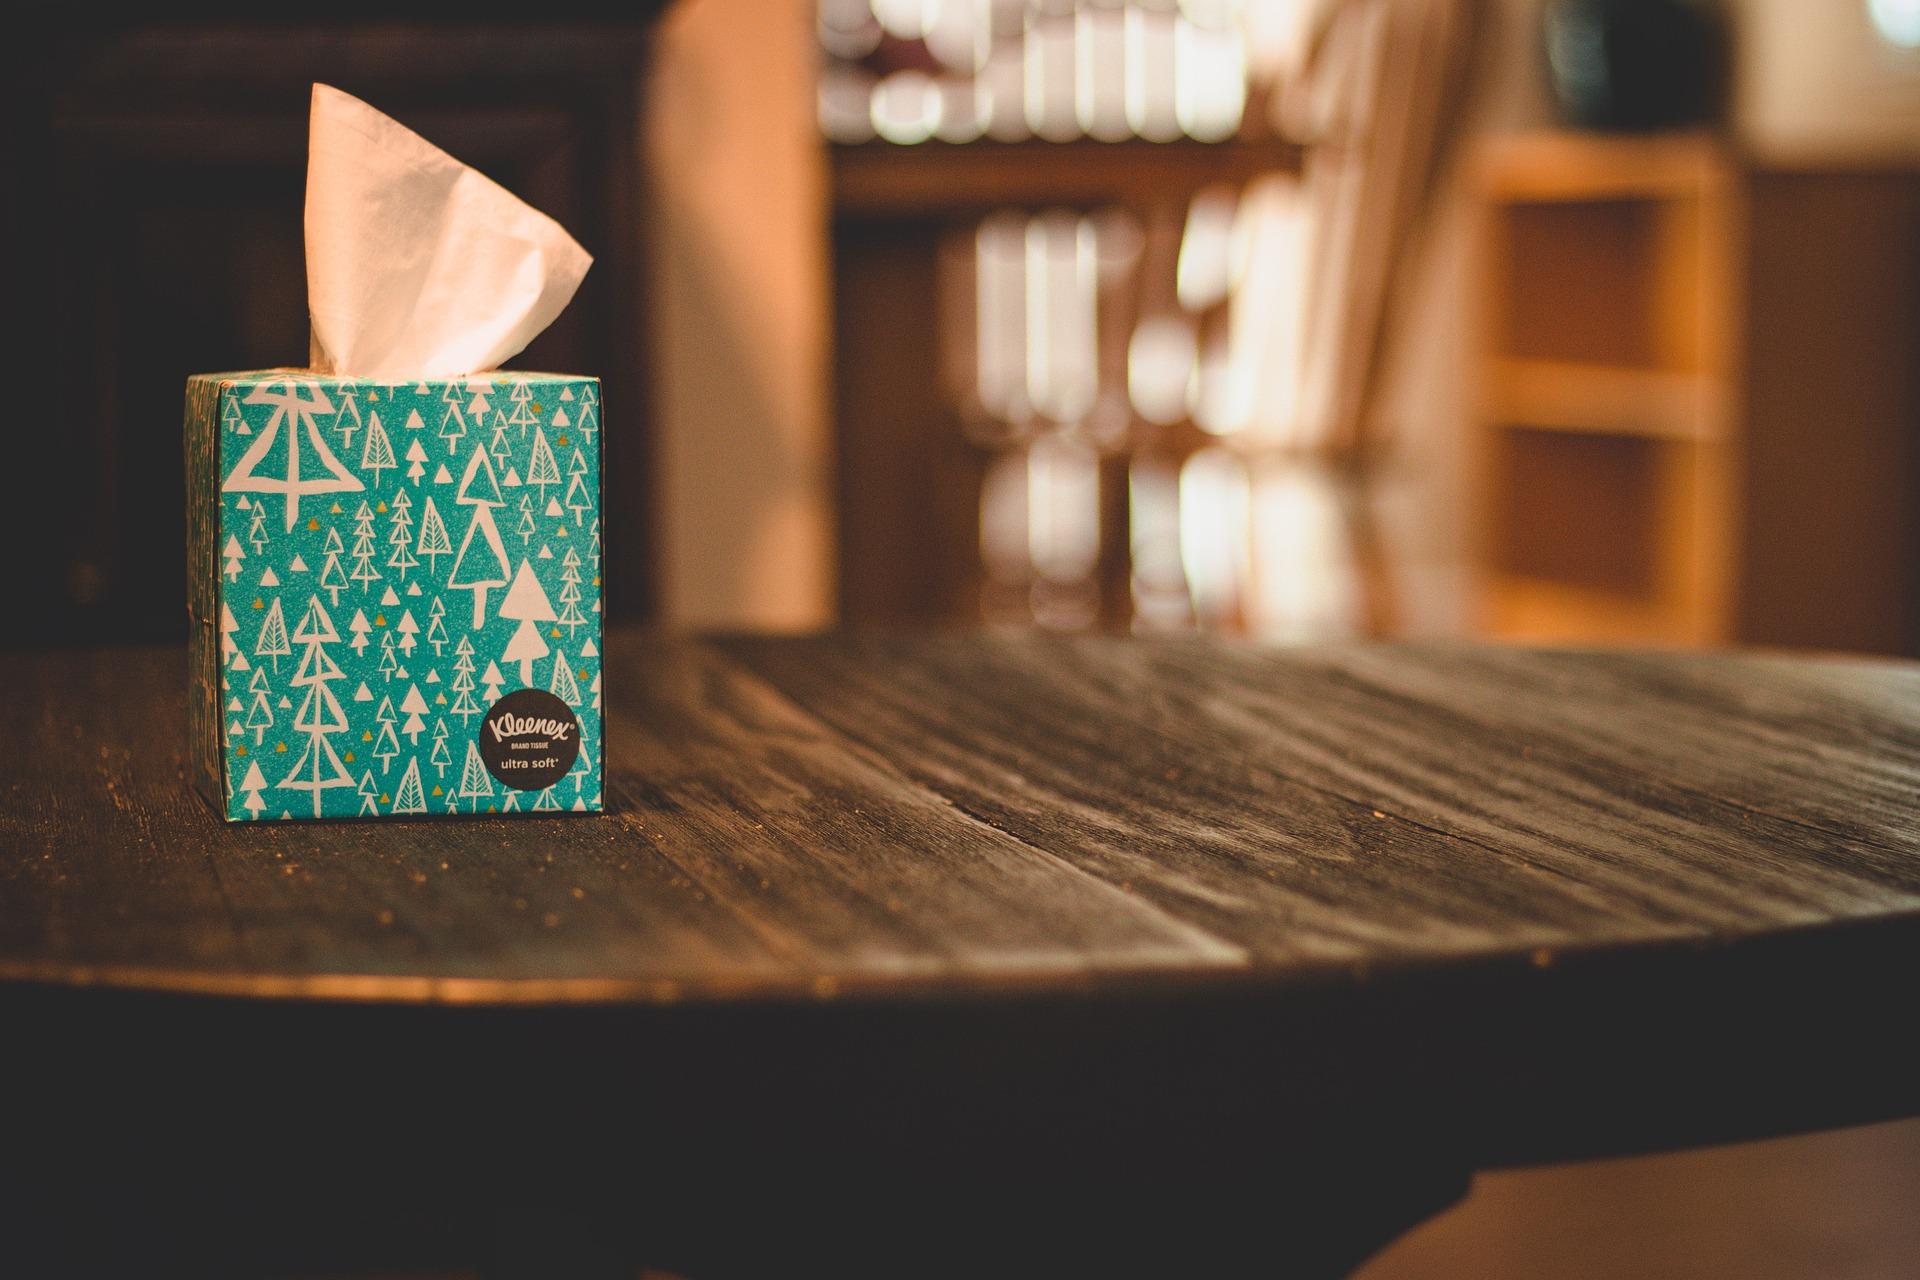 tissue box for mucus and phlegm